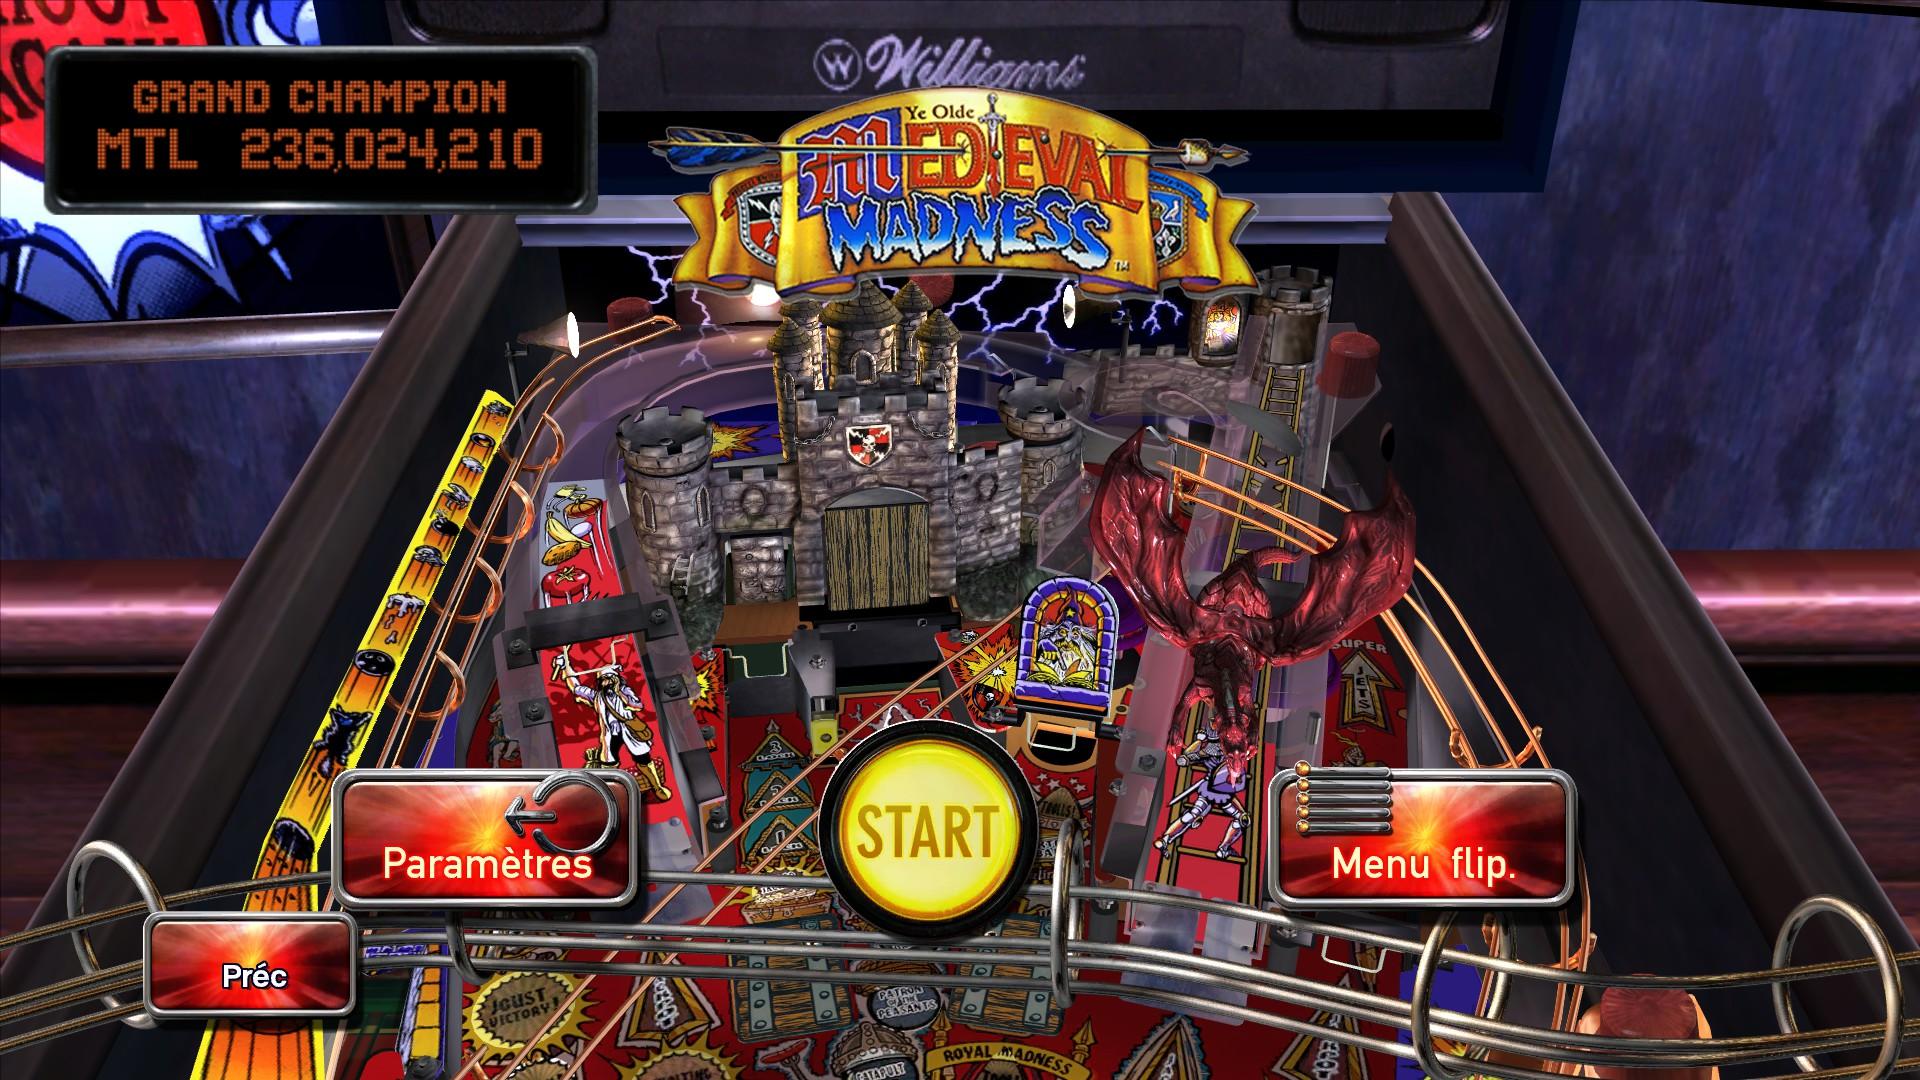 Mantalow: Pinball Arcade: Medieval Madness (PC) 236,024,210 points on 2015-04-11 11:21:44